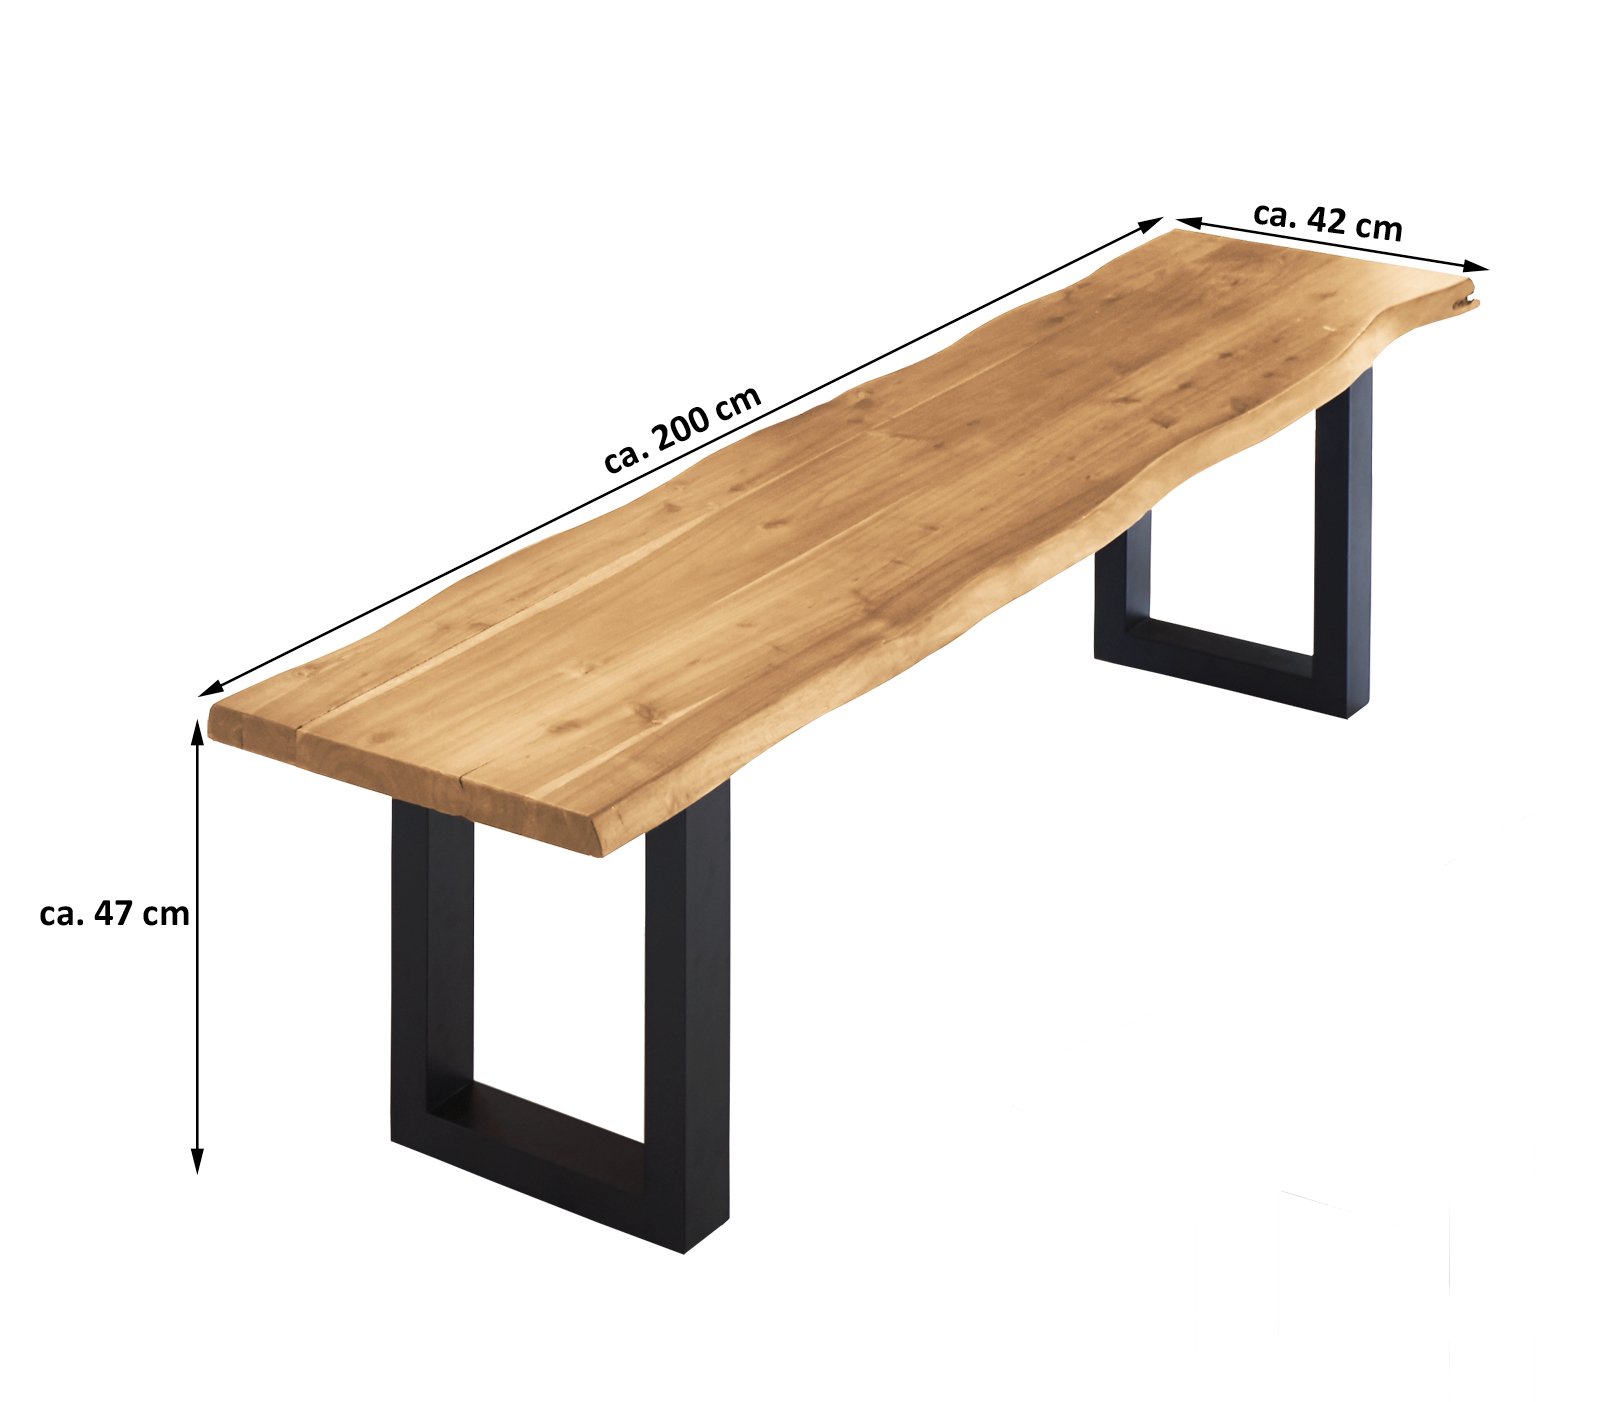 sam sitzbank holz massiv baumkante 200 x 47 x 40 cm akazie milo demn chst. Black Bedroom Furniture Sets. Home Design Ideas